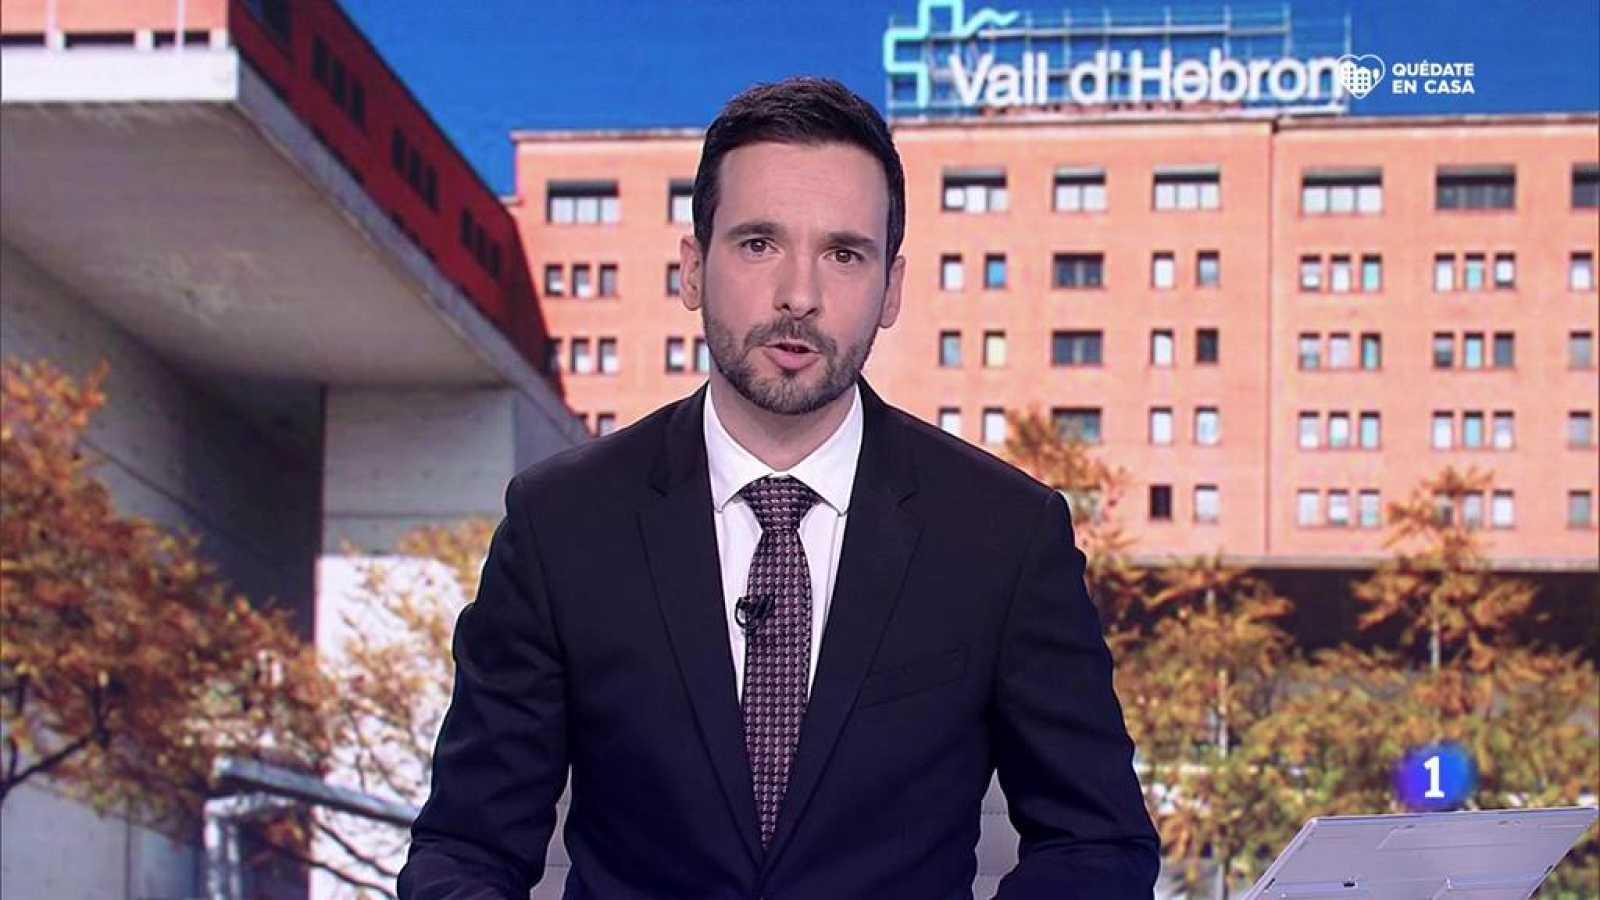 Barcelona acondicionará centros deportivos para atender a los pacientes con coronavirus menos graves